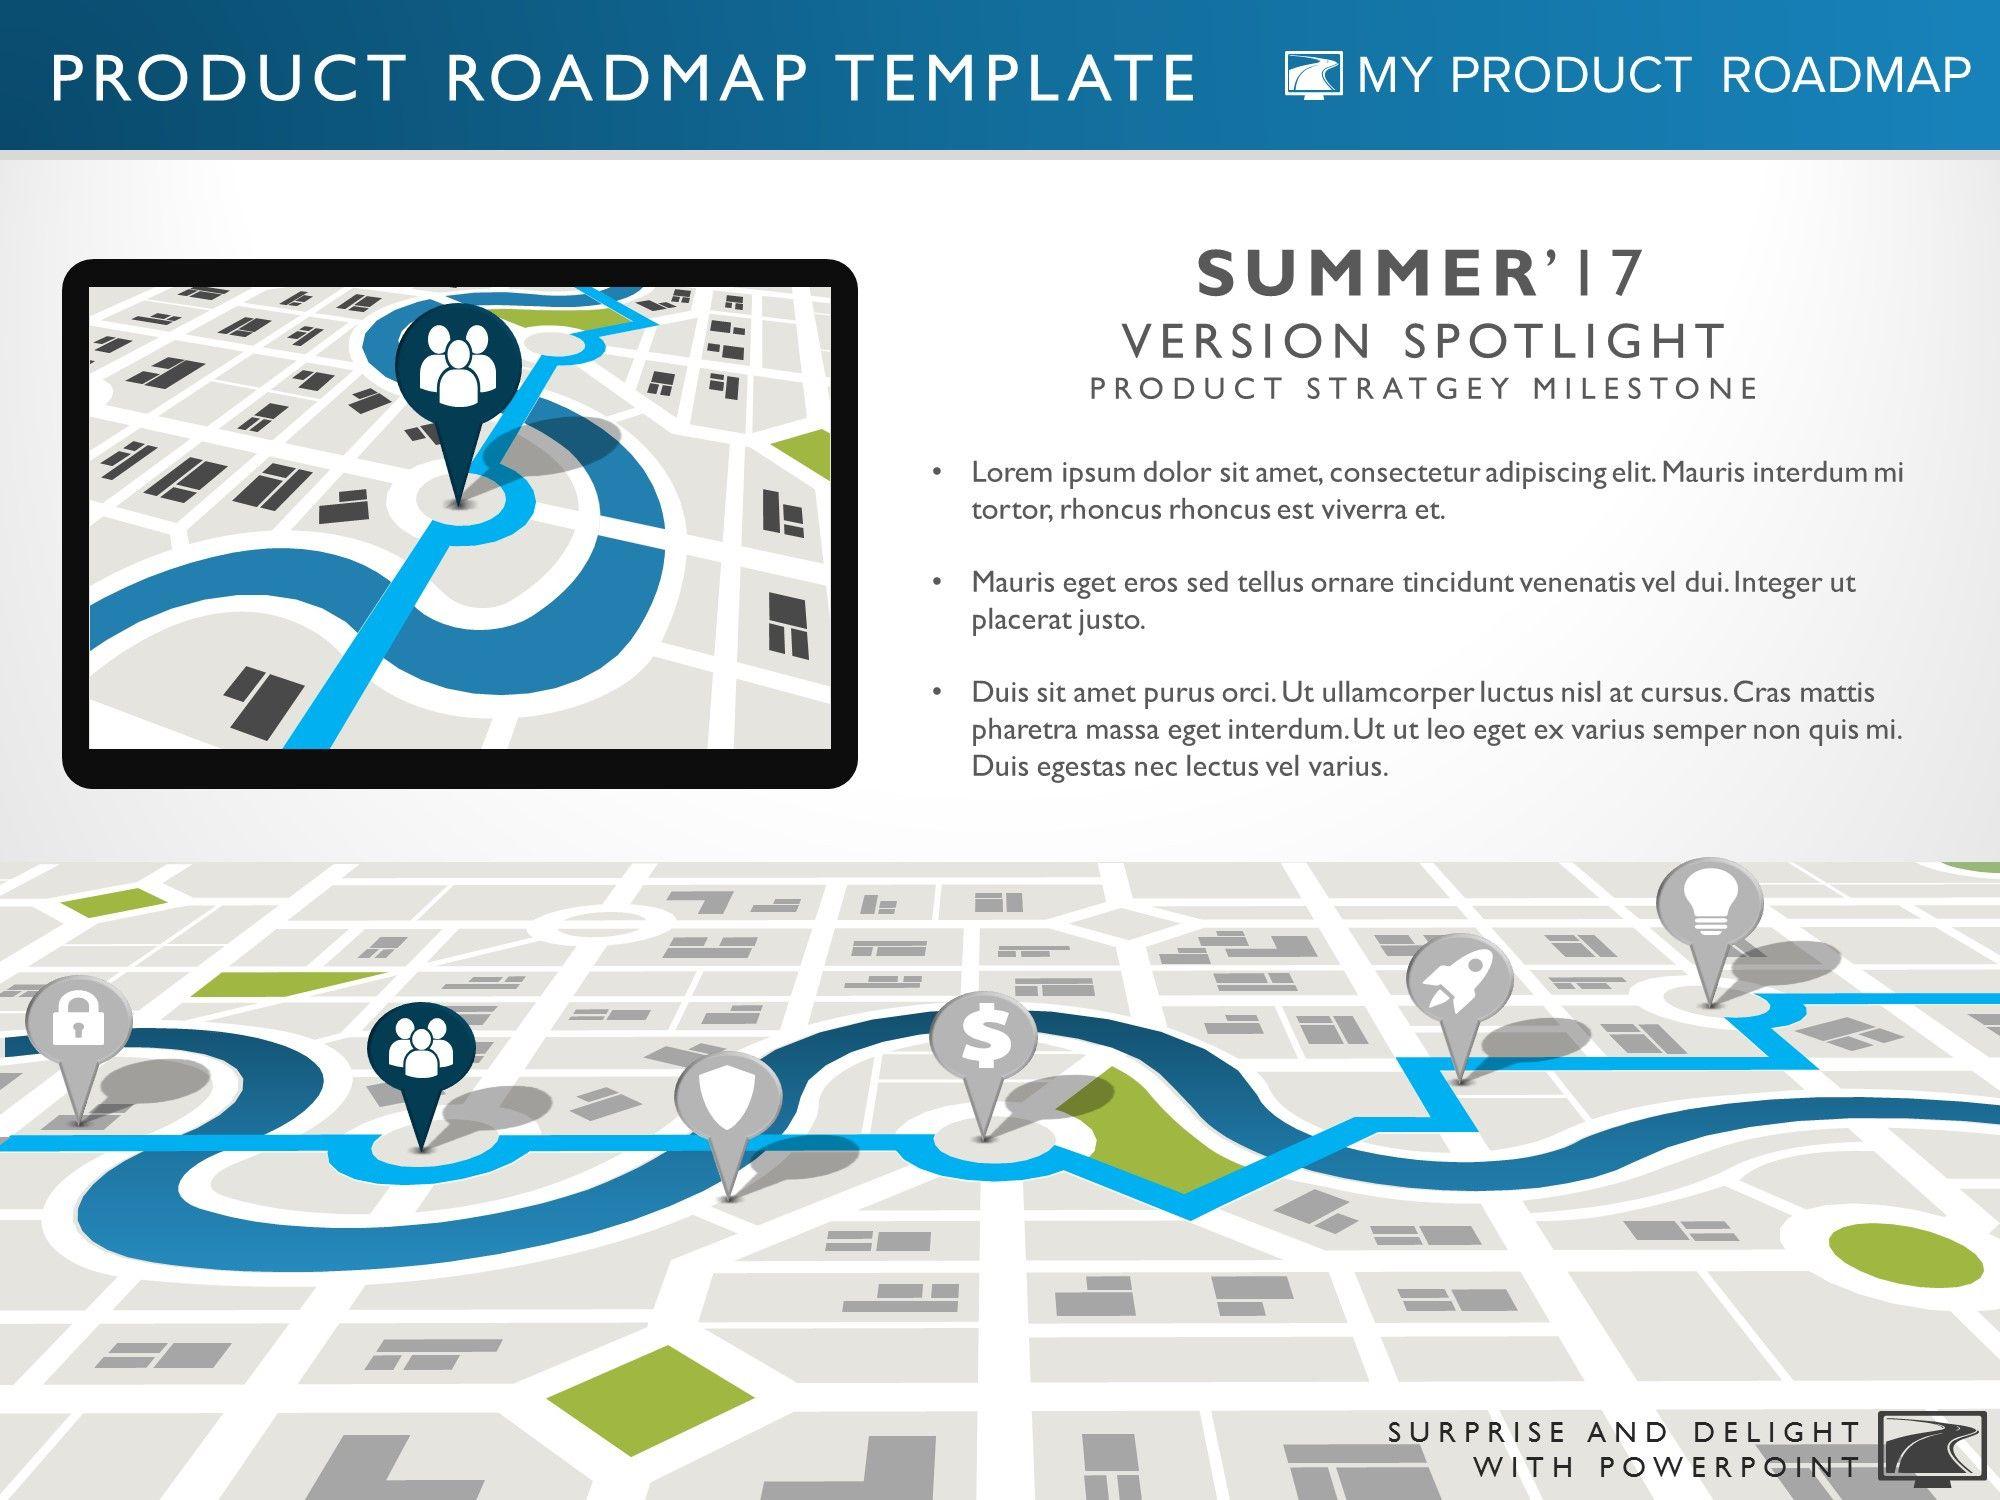 Six Phase Technology Strategy Timeline Roadmap Presentation Diagram ...